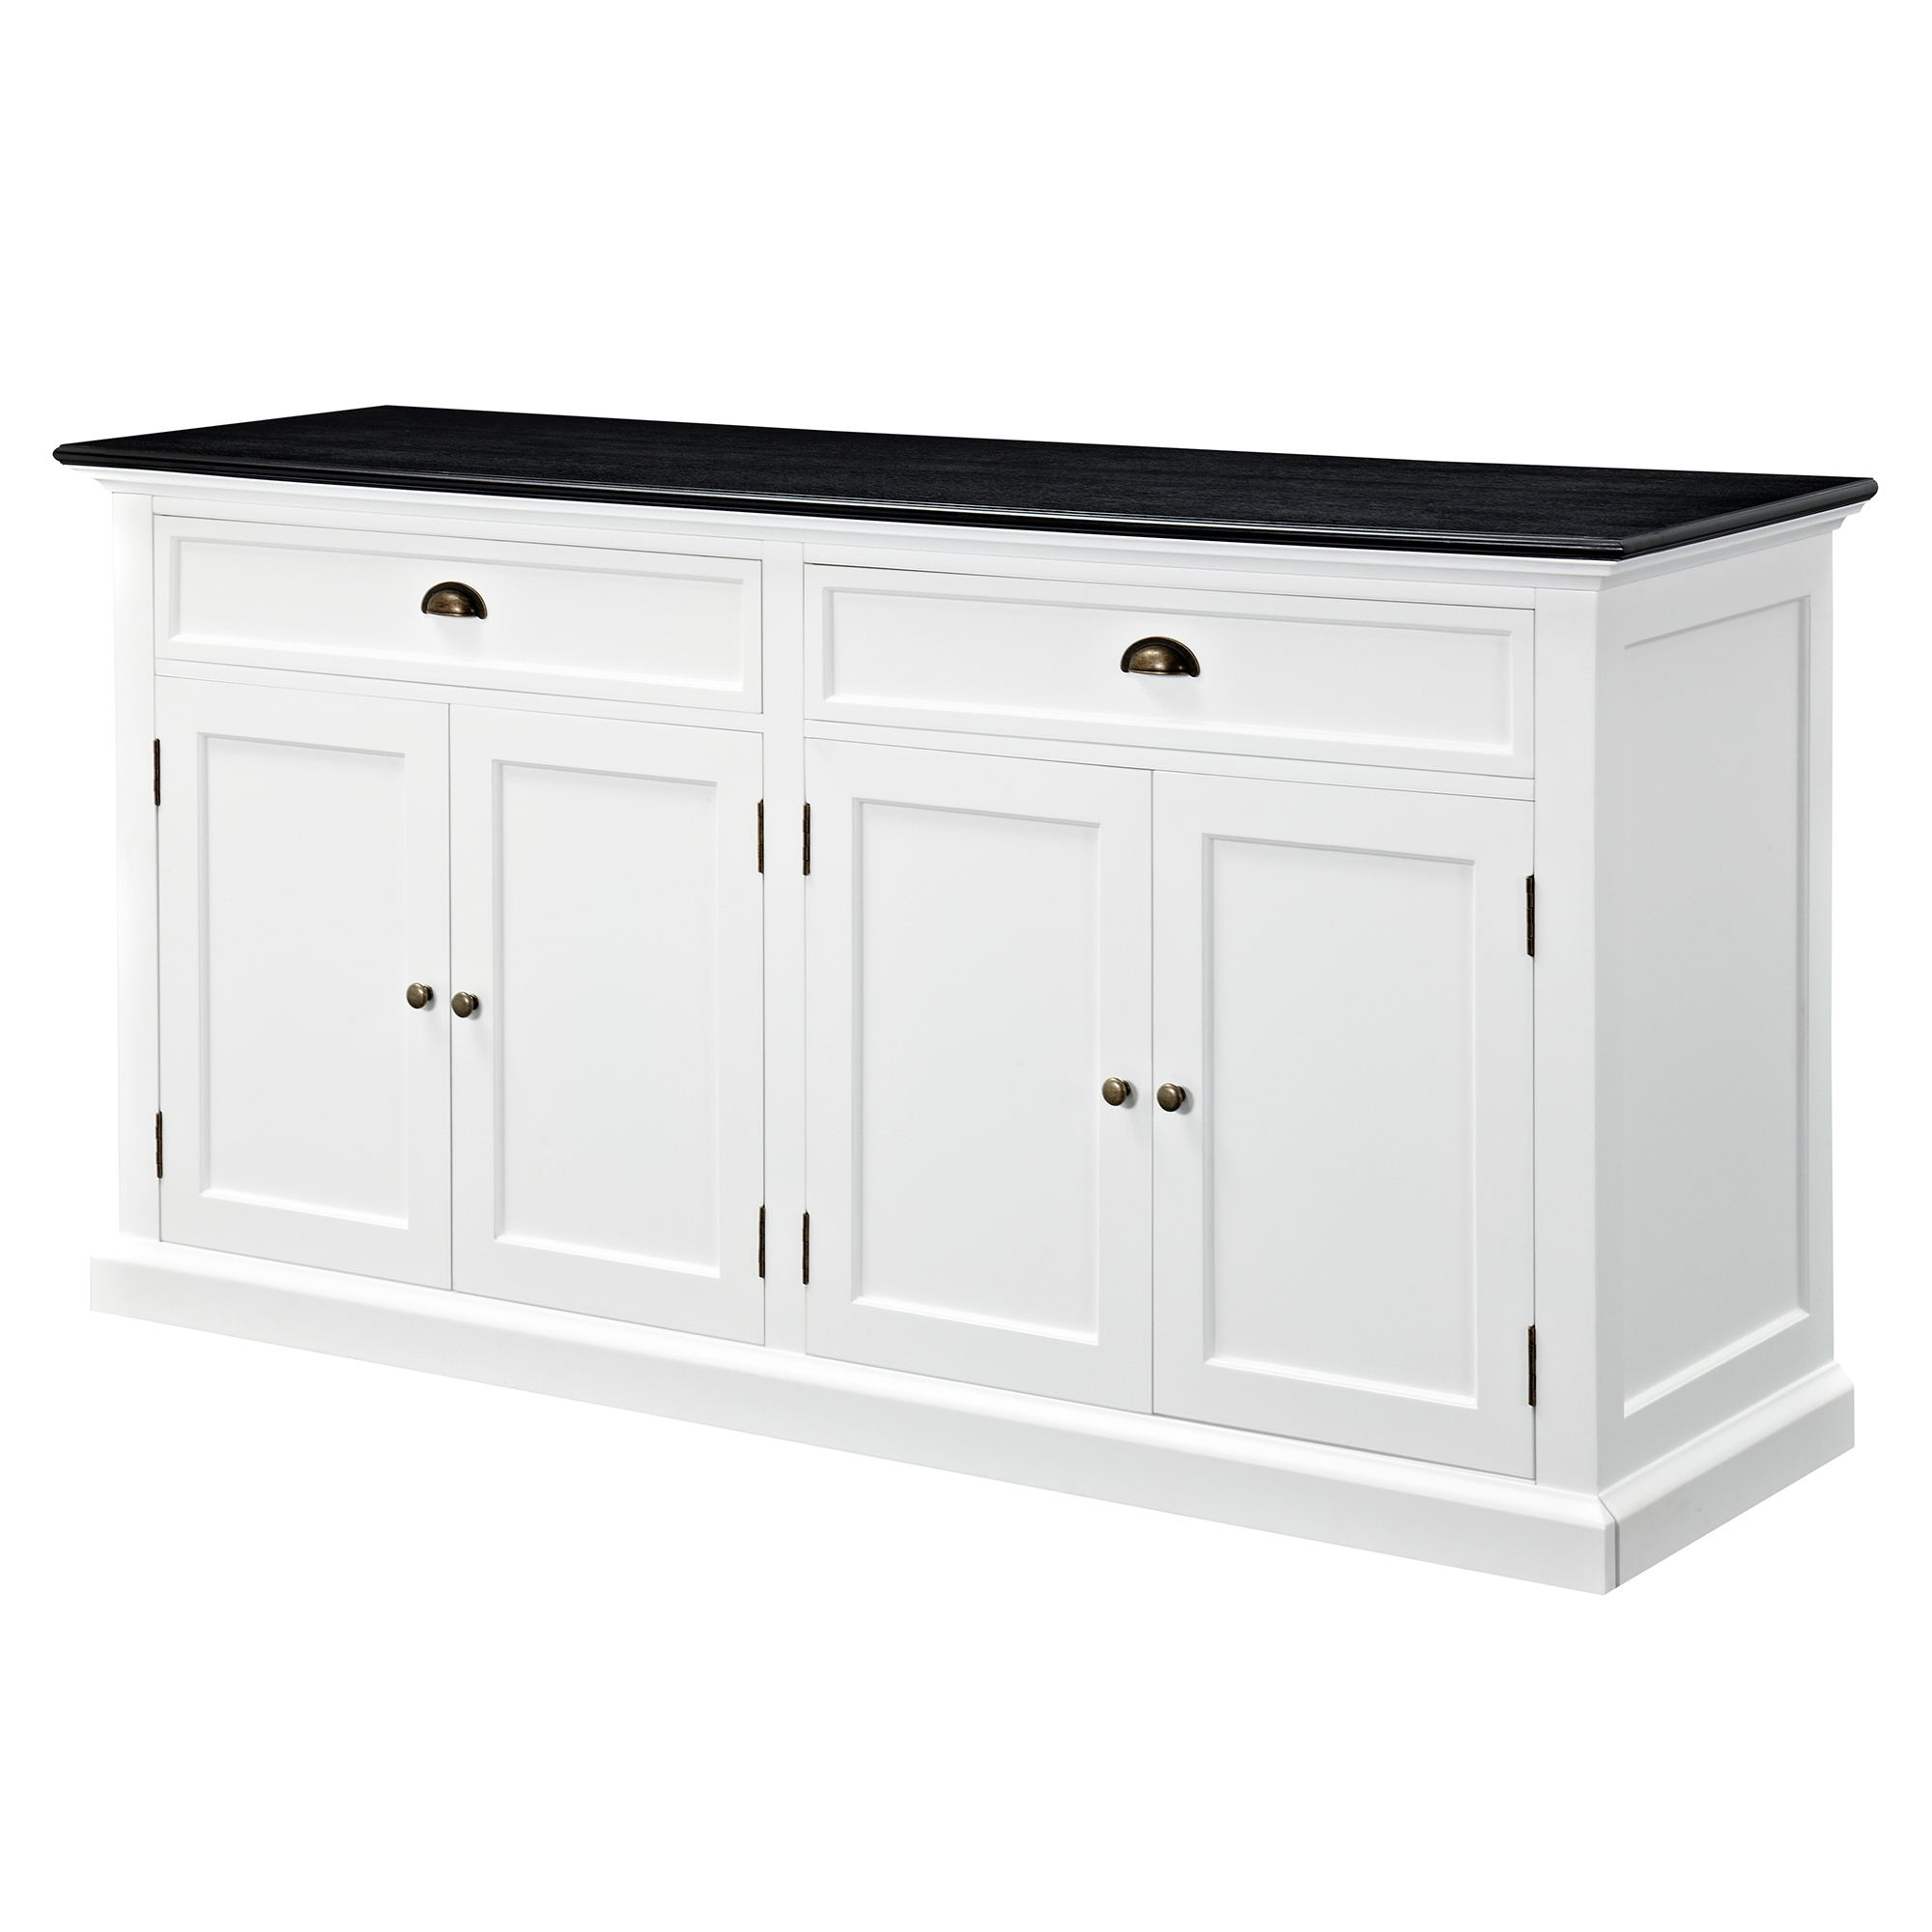 temple webster hamptons large sideboard buffet black top reviews rh templeandwebster com au